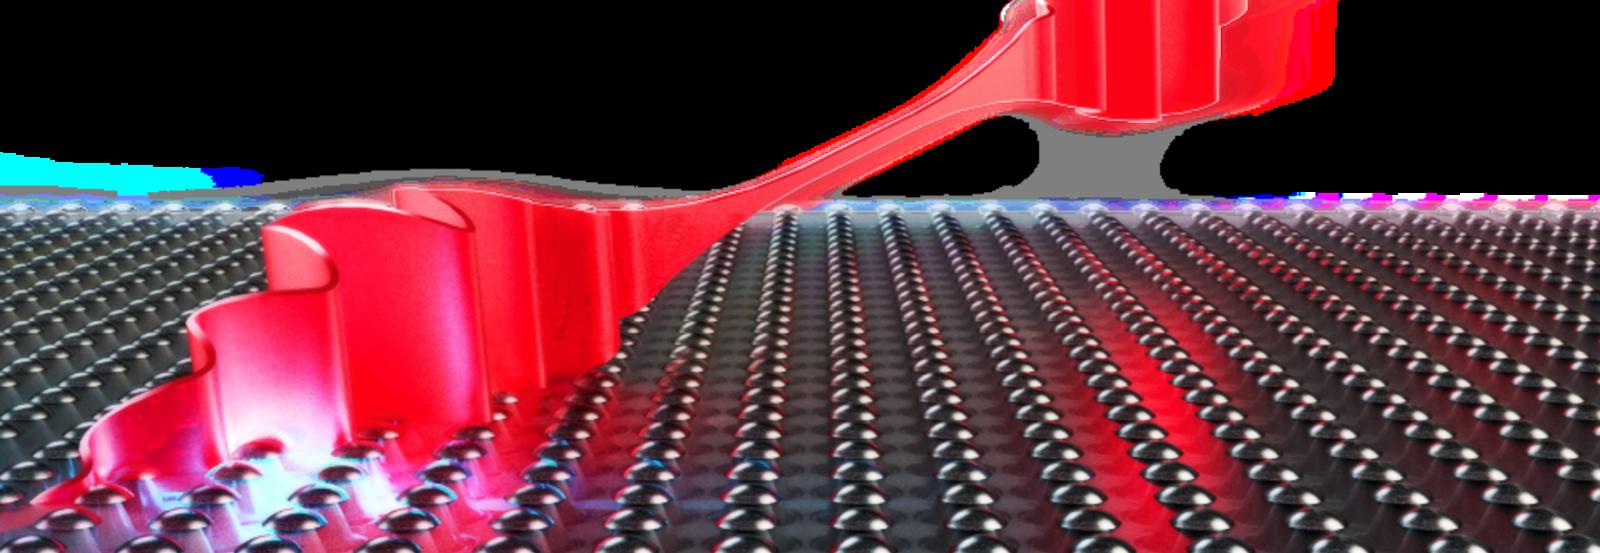 Red sensor